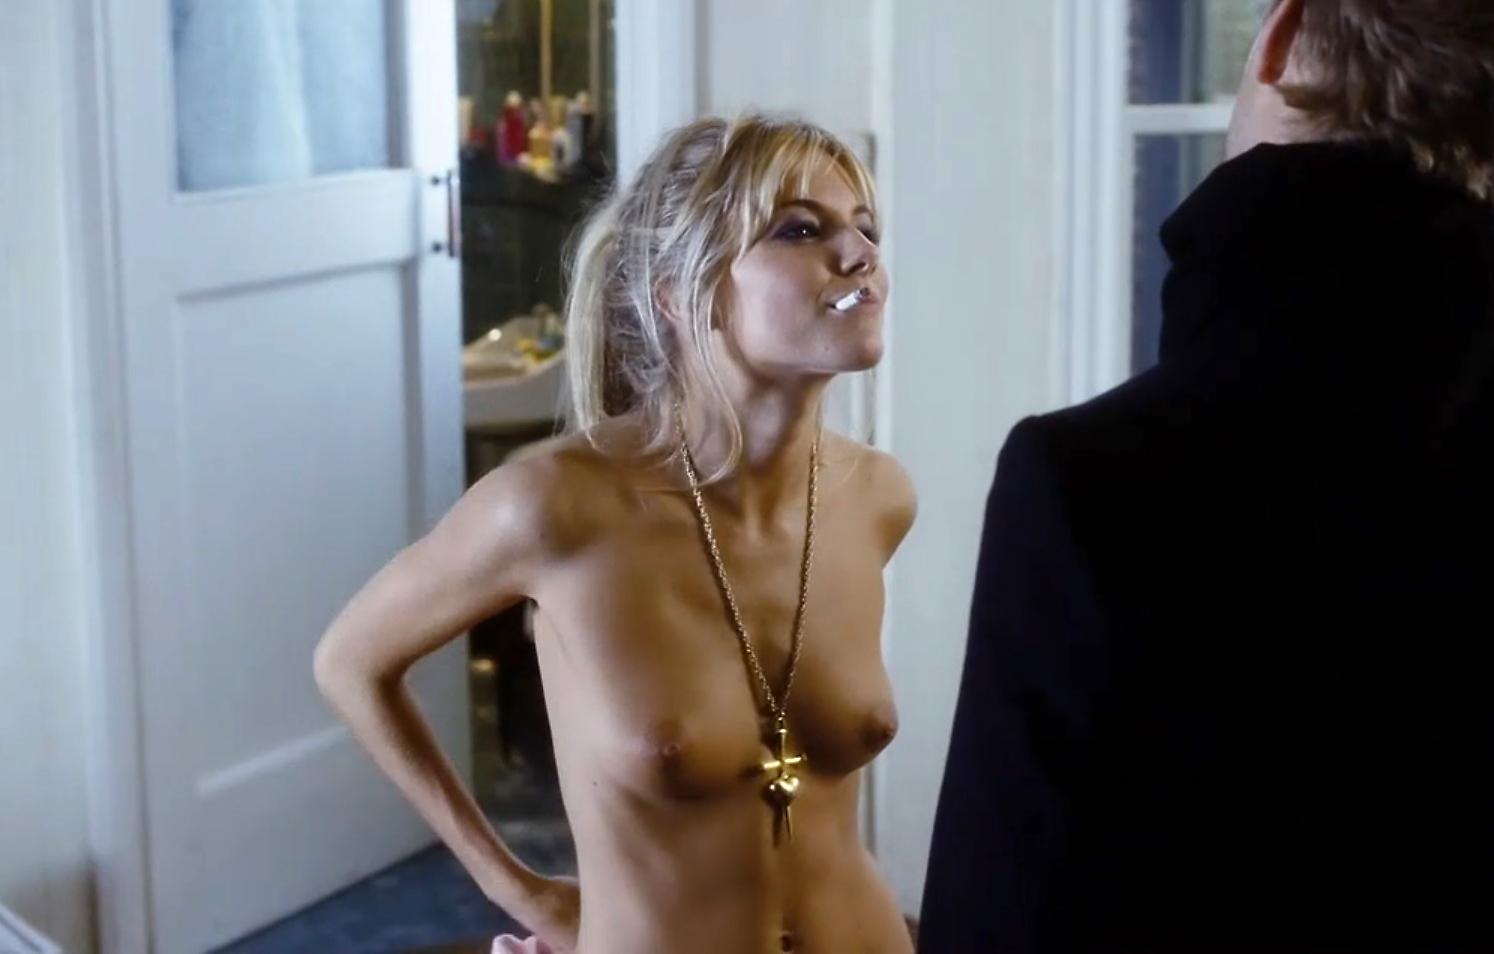 Sienna miller topless in alfie movie nudes (11 photo), Instagram Celebrity images